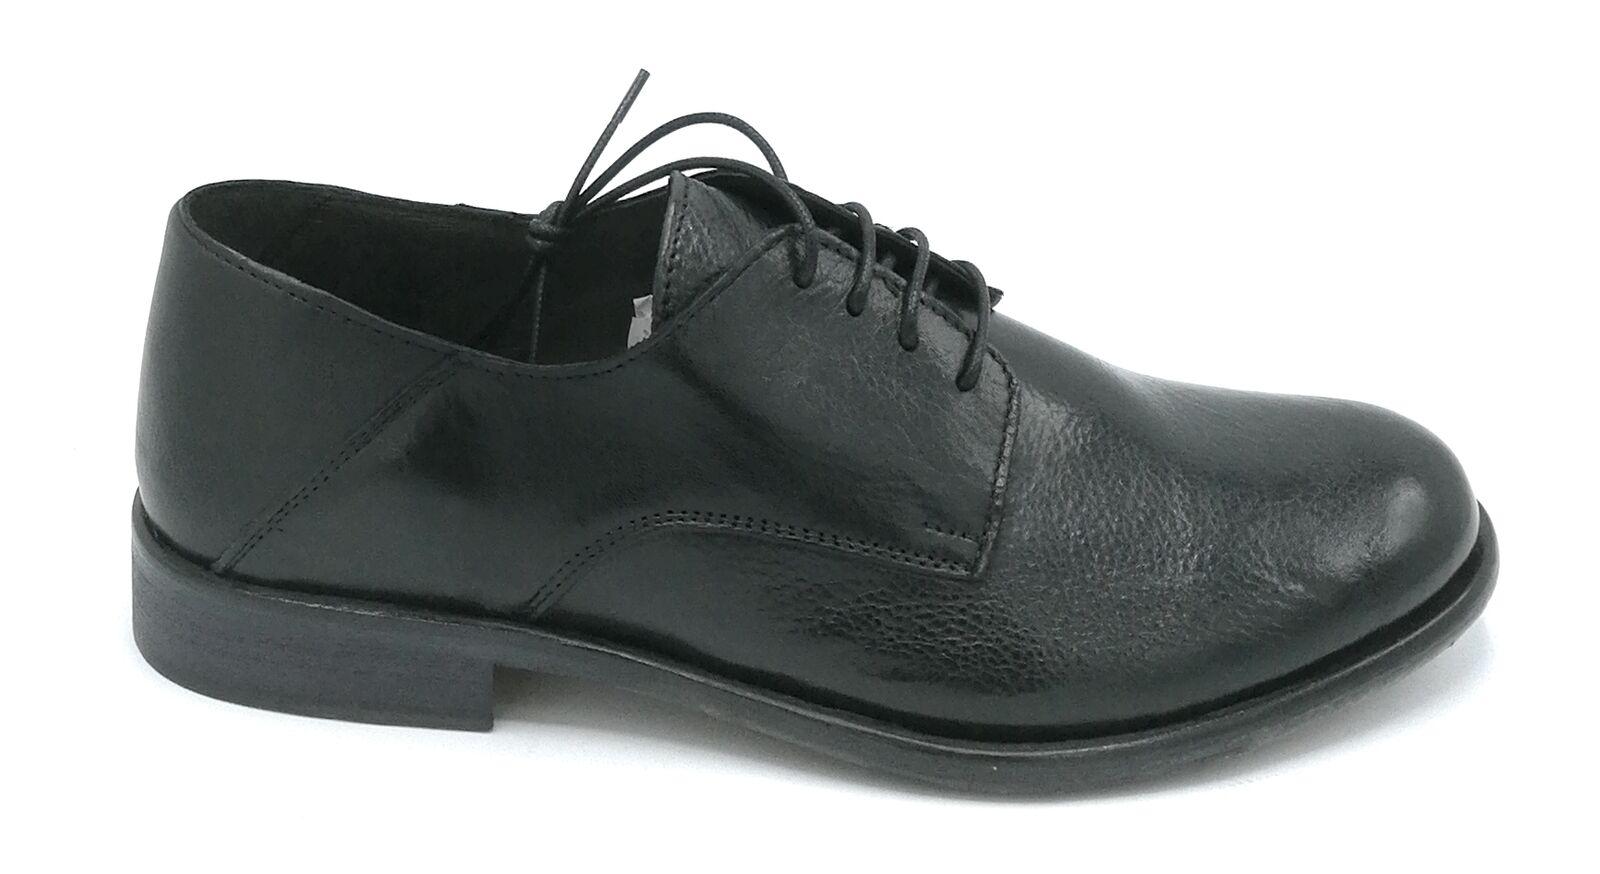 Exton 3101 Shoe Lace Up Black Leather W